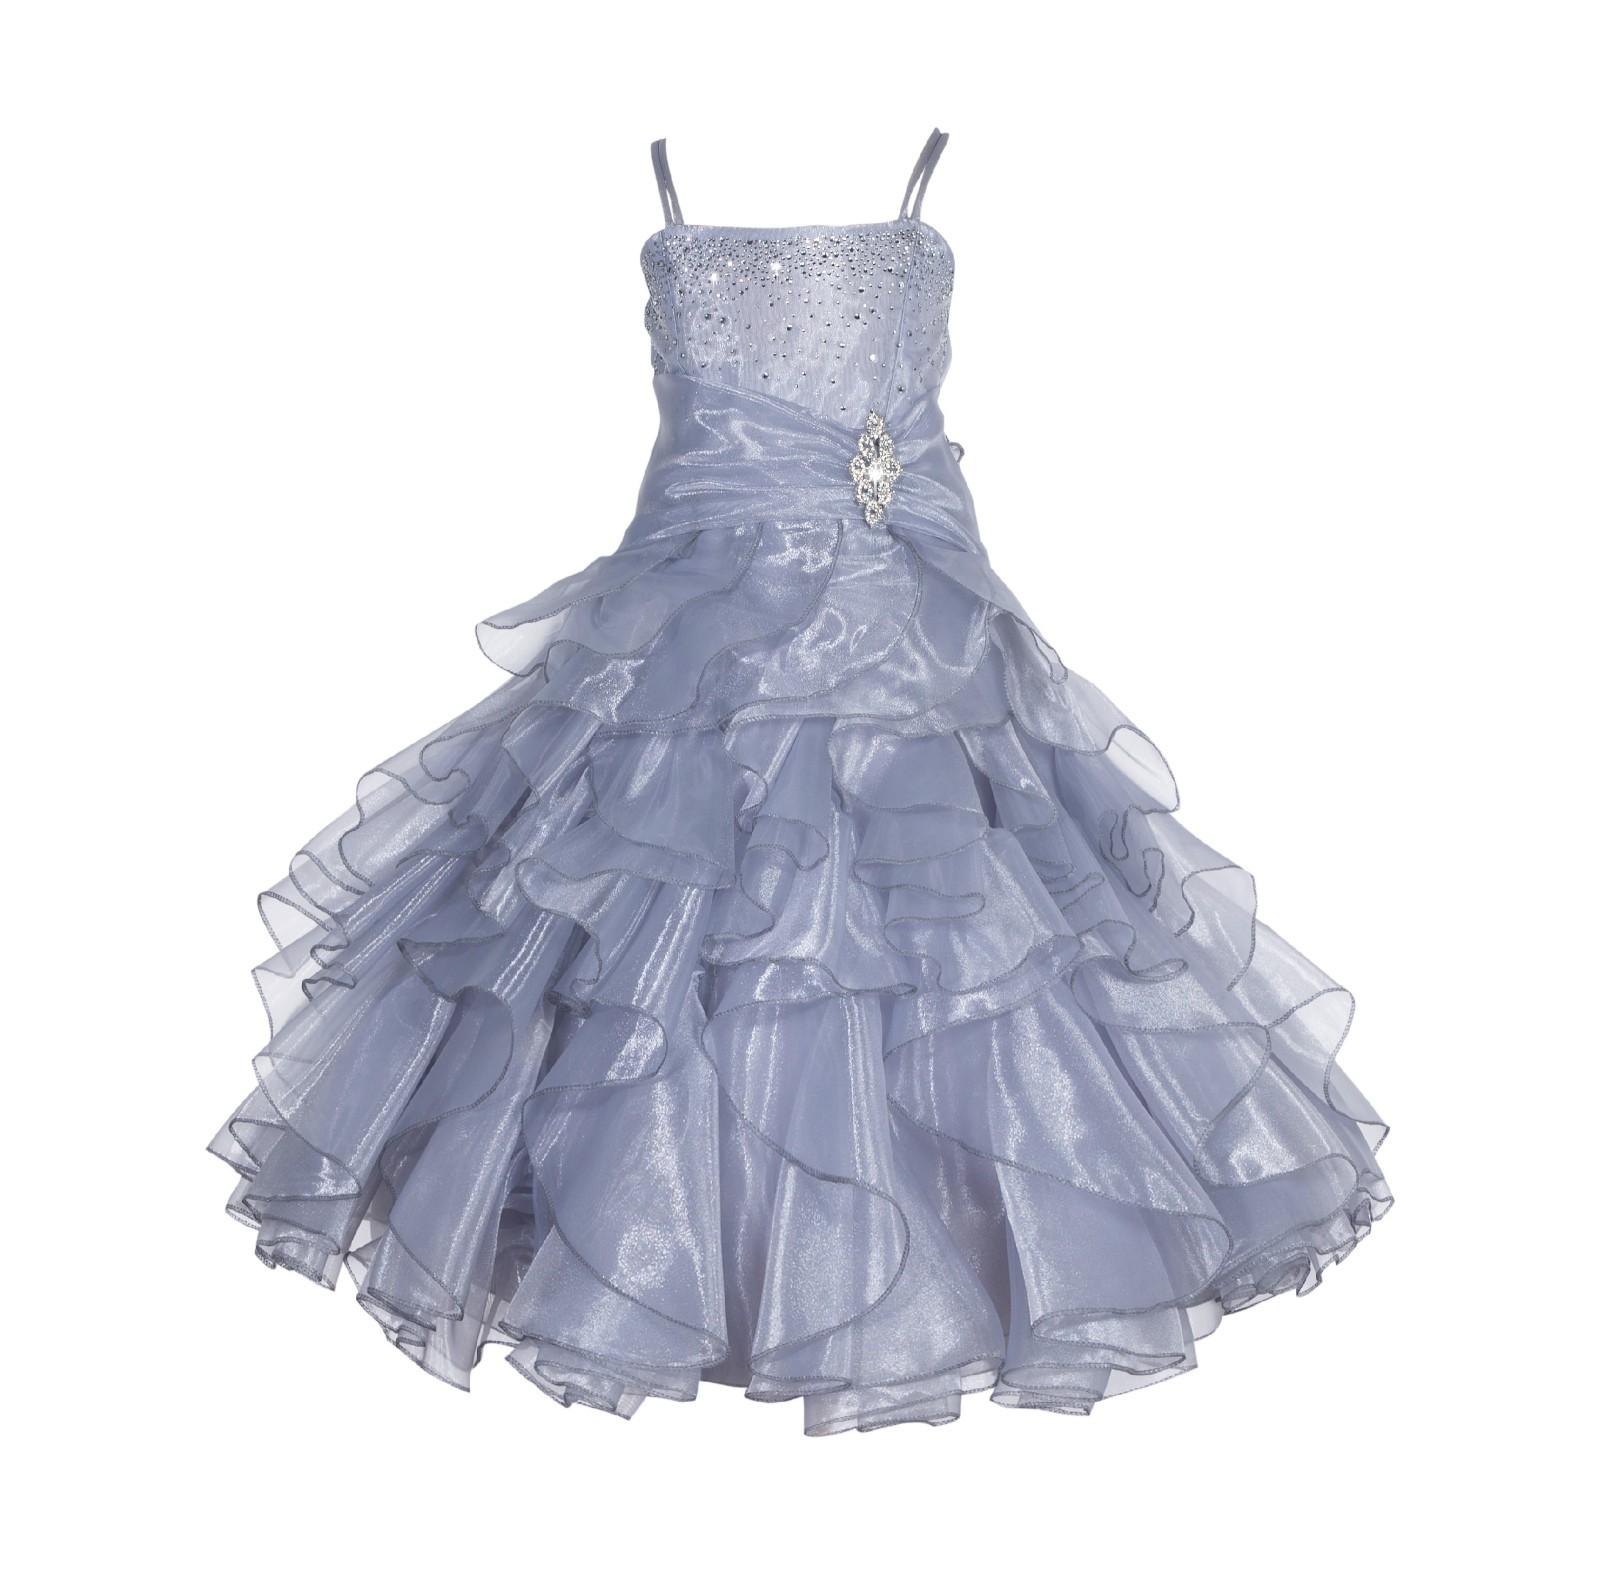 Silver Rhinestone Organza Layers Flower Girl Dress Elegant Stunning 164S